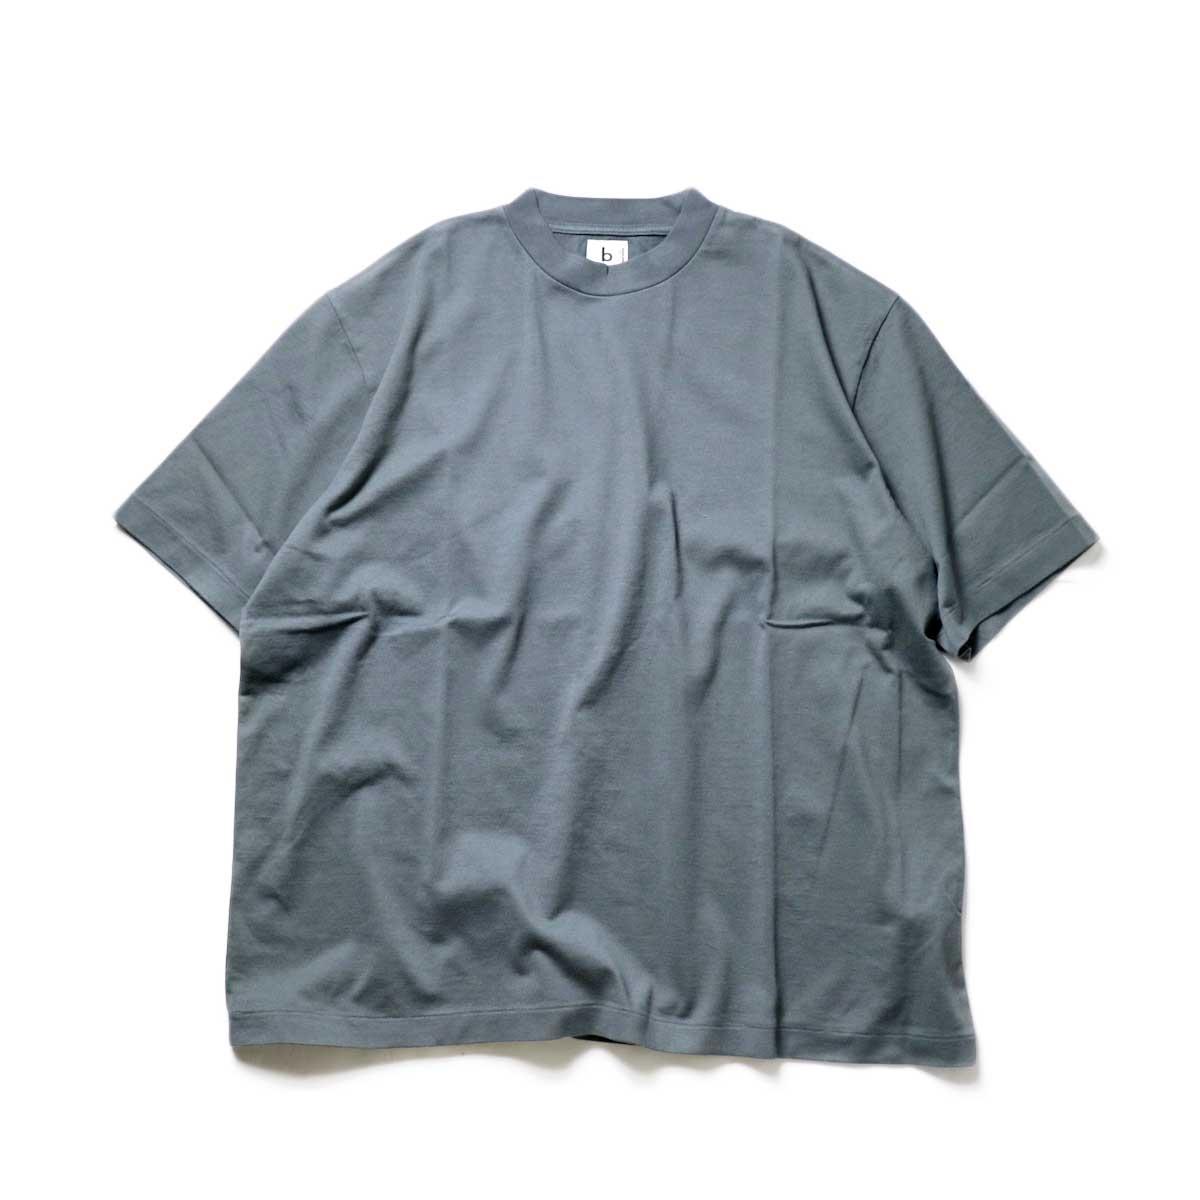 blurhms ROOTSTOCK / Extra Soft Tee BIG S/S (Khaki Grey)